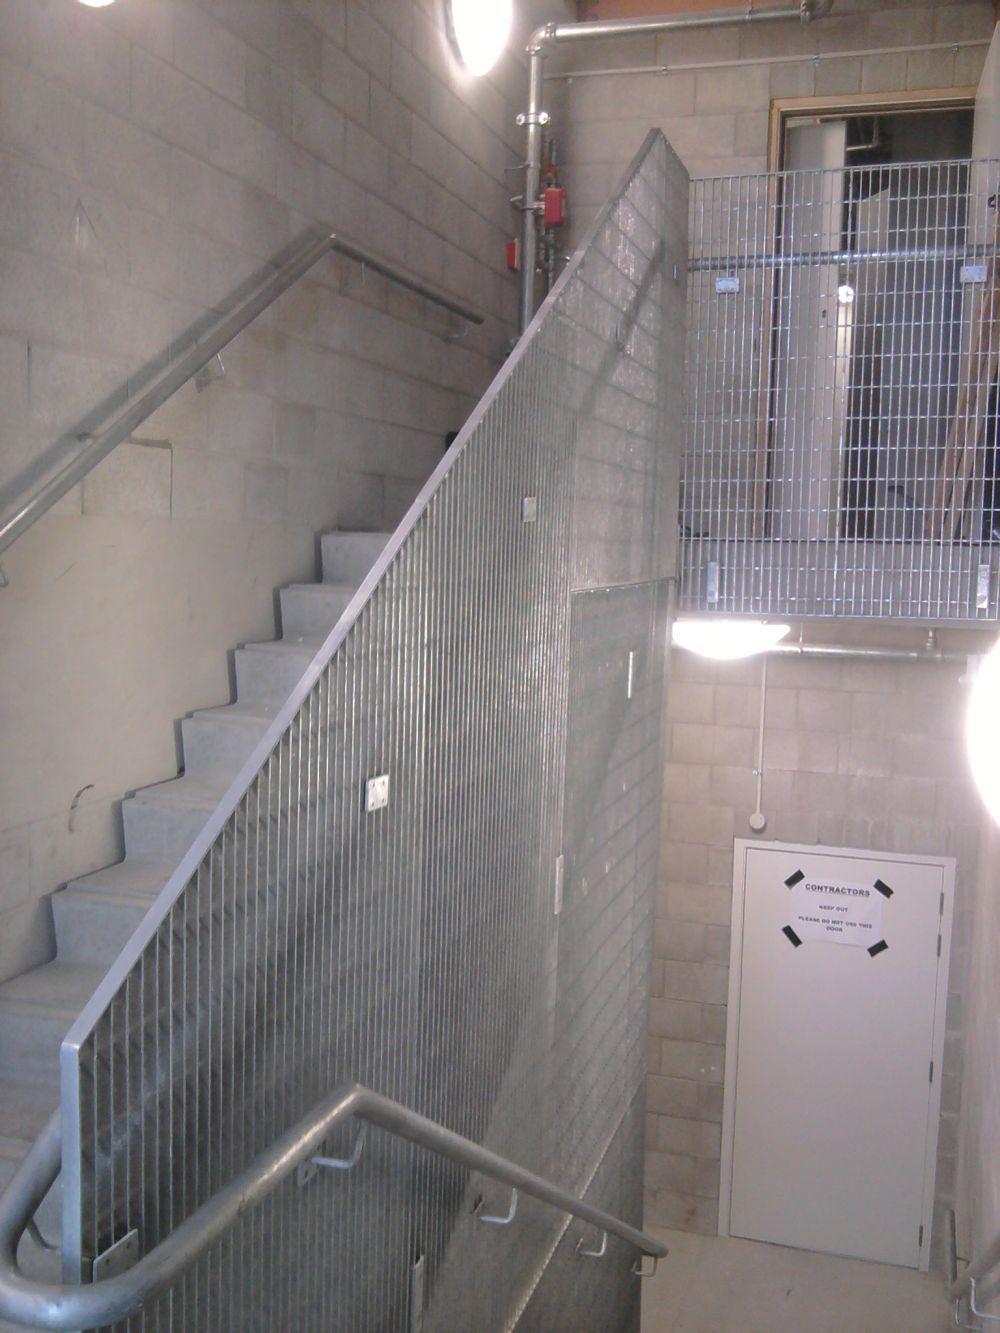 Mesh partition & handrail